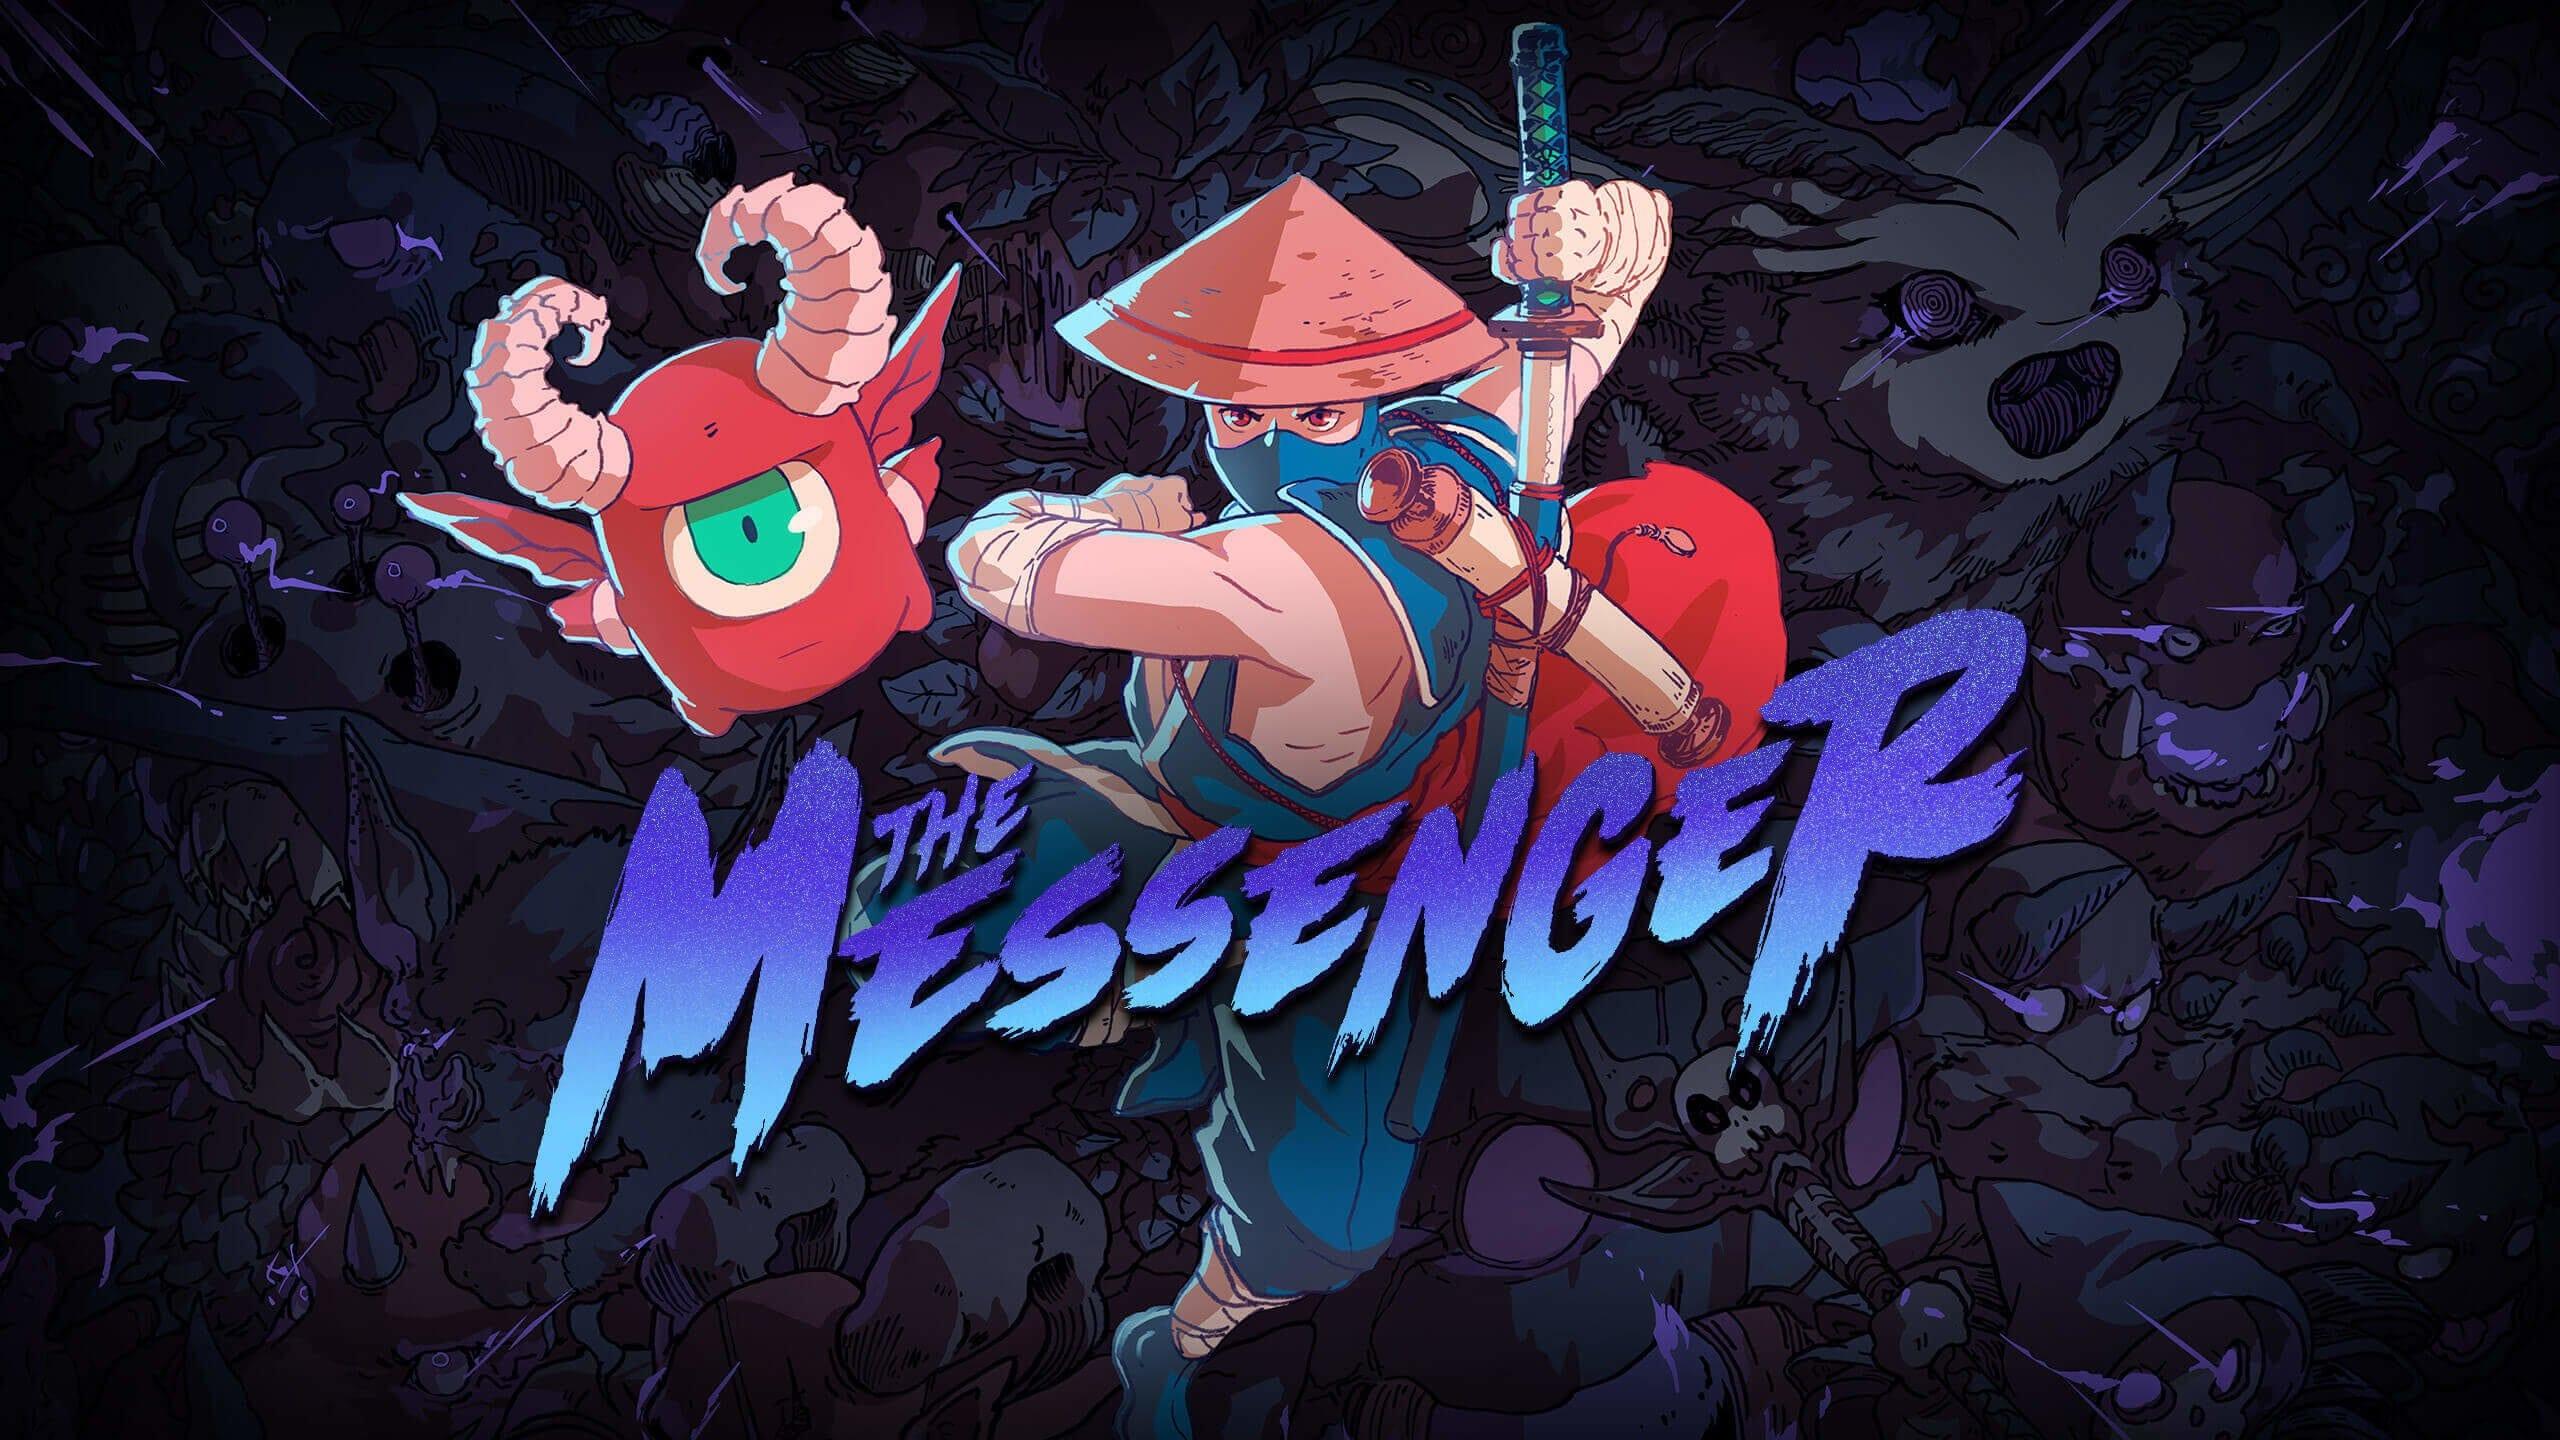 В Epic Games Store бесплатно раздают платформер The Messenger